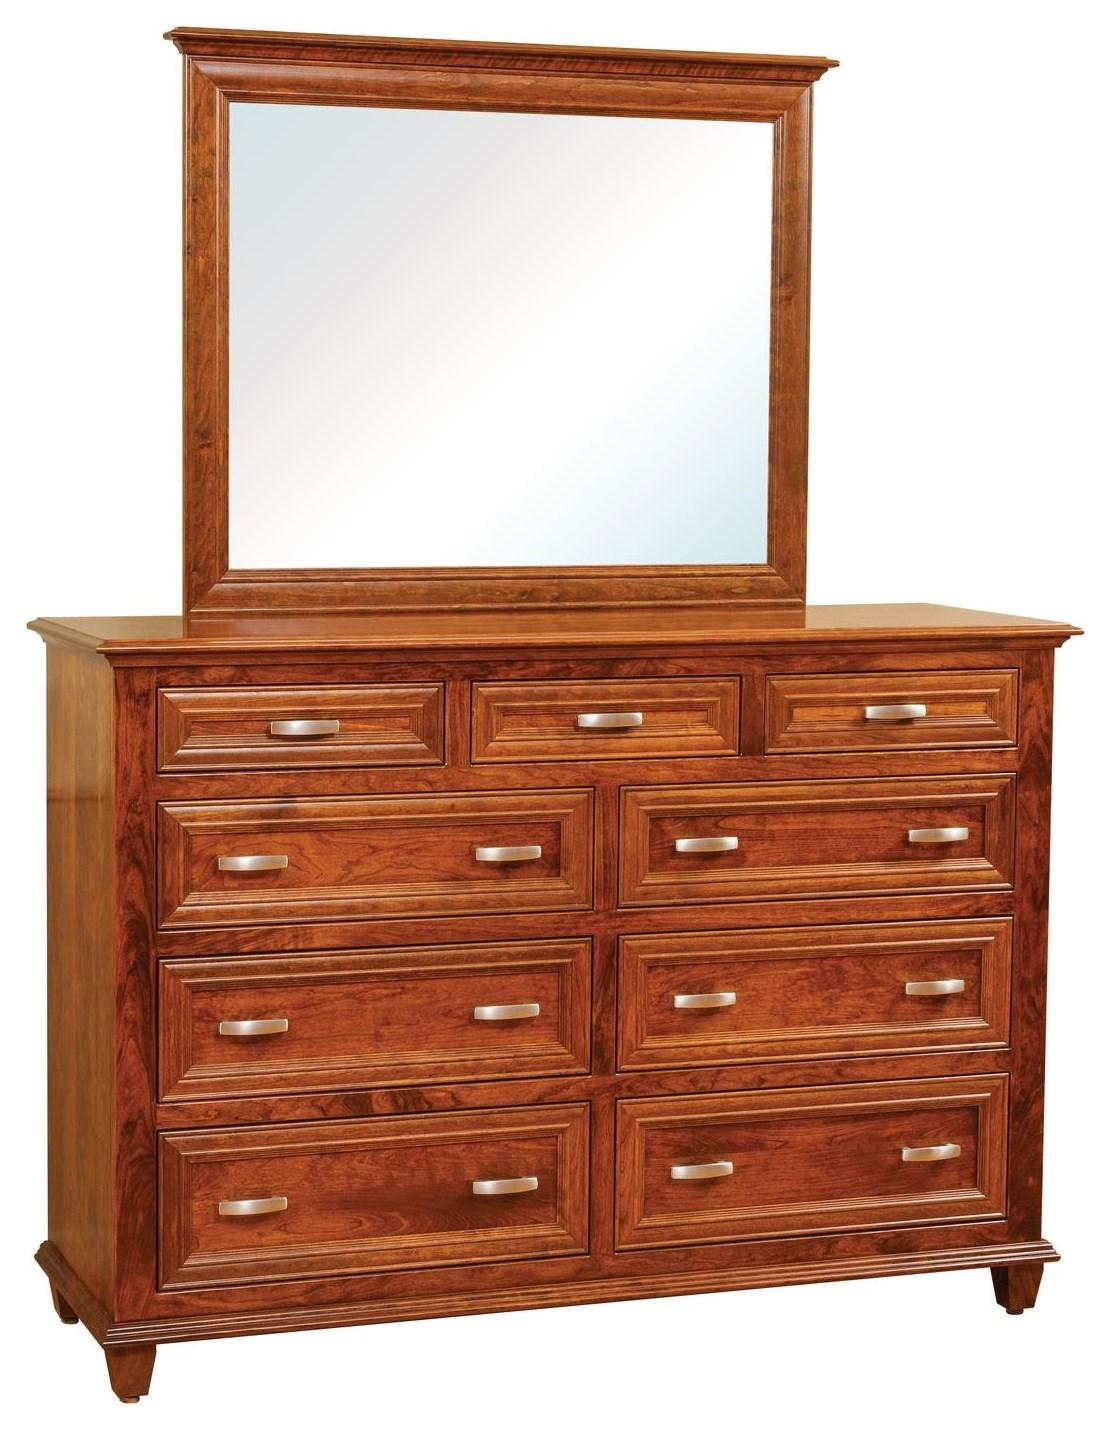 Wayside Custom Furniture Rosedale 9 Drawer Dresser & Mirror - Item Number: 3233-3240